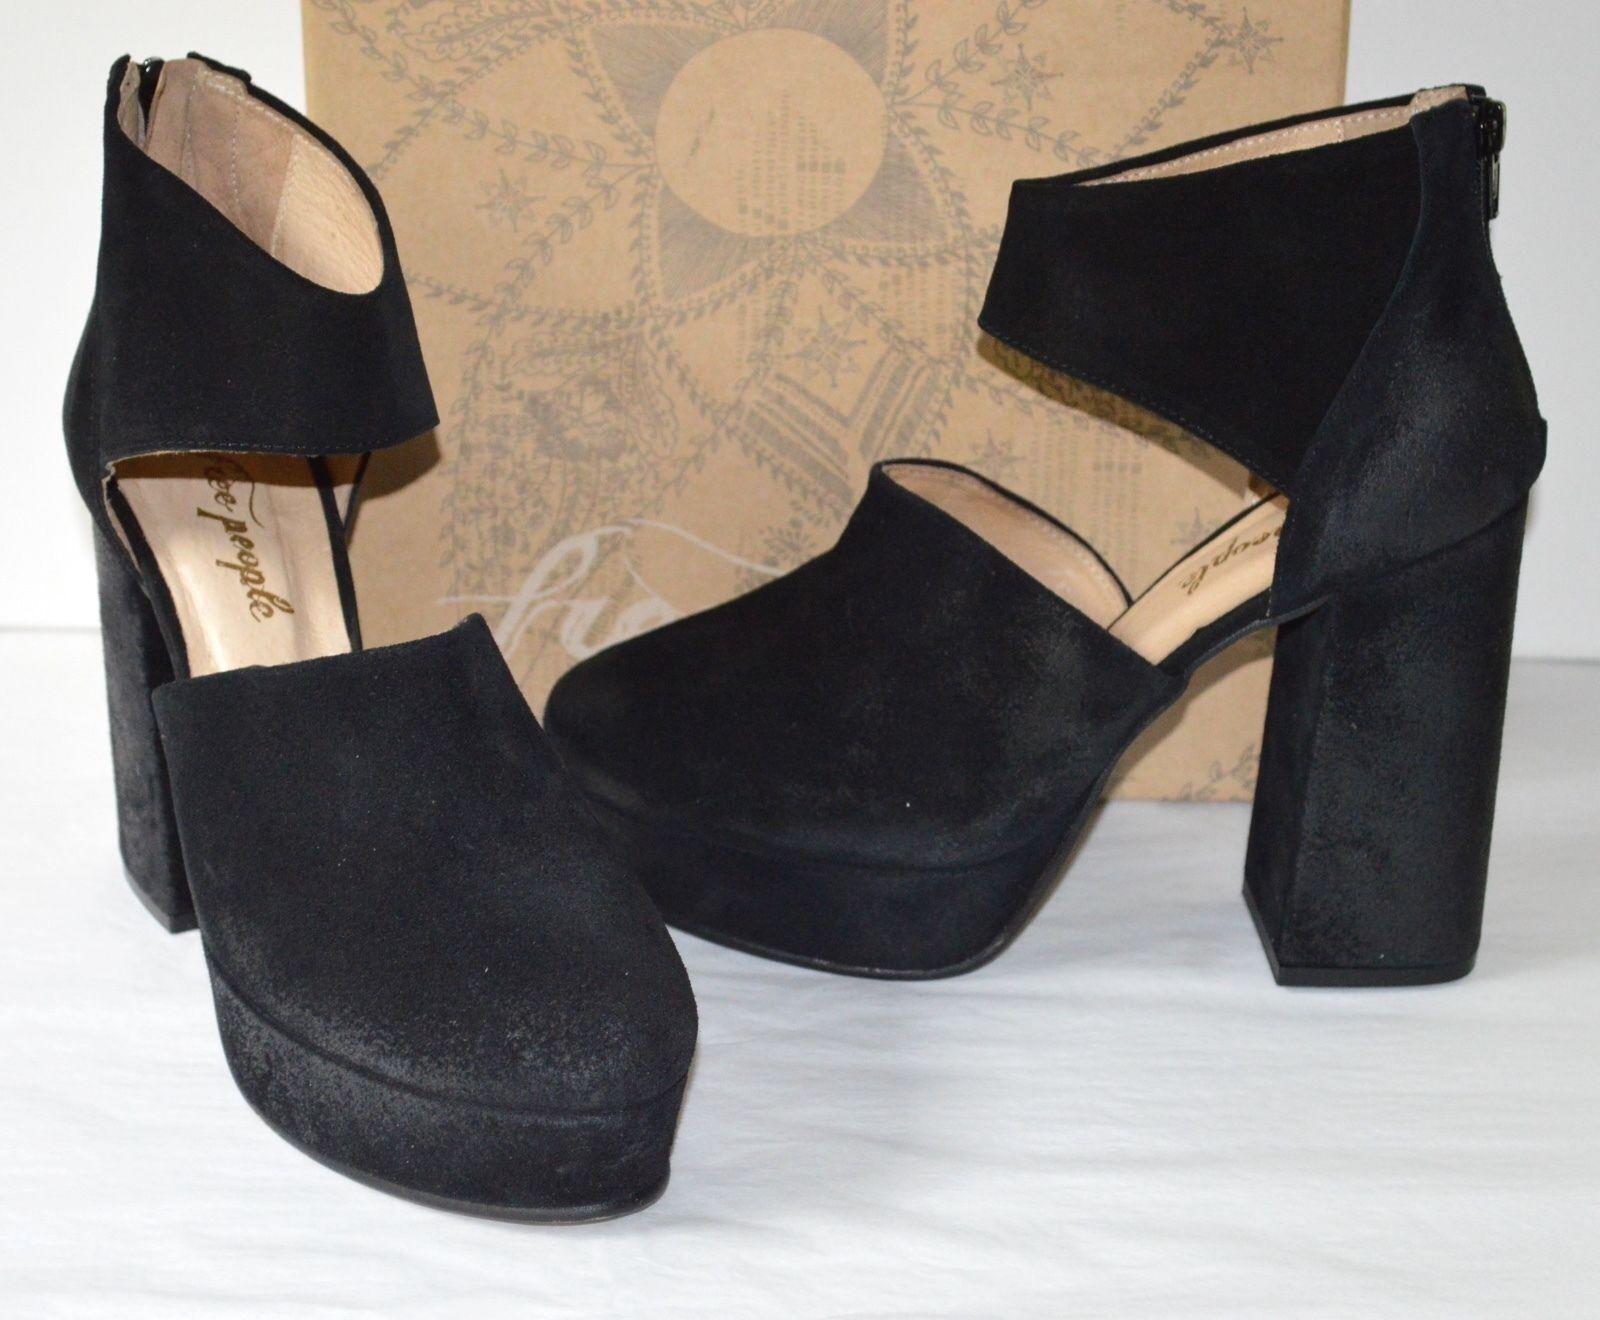 il più economico New  178 Free People People People Platform Heel Luxor nero Burnished Leather Suede 38 8  il più alla moda